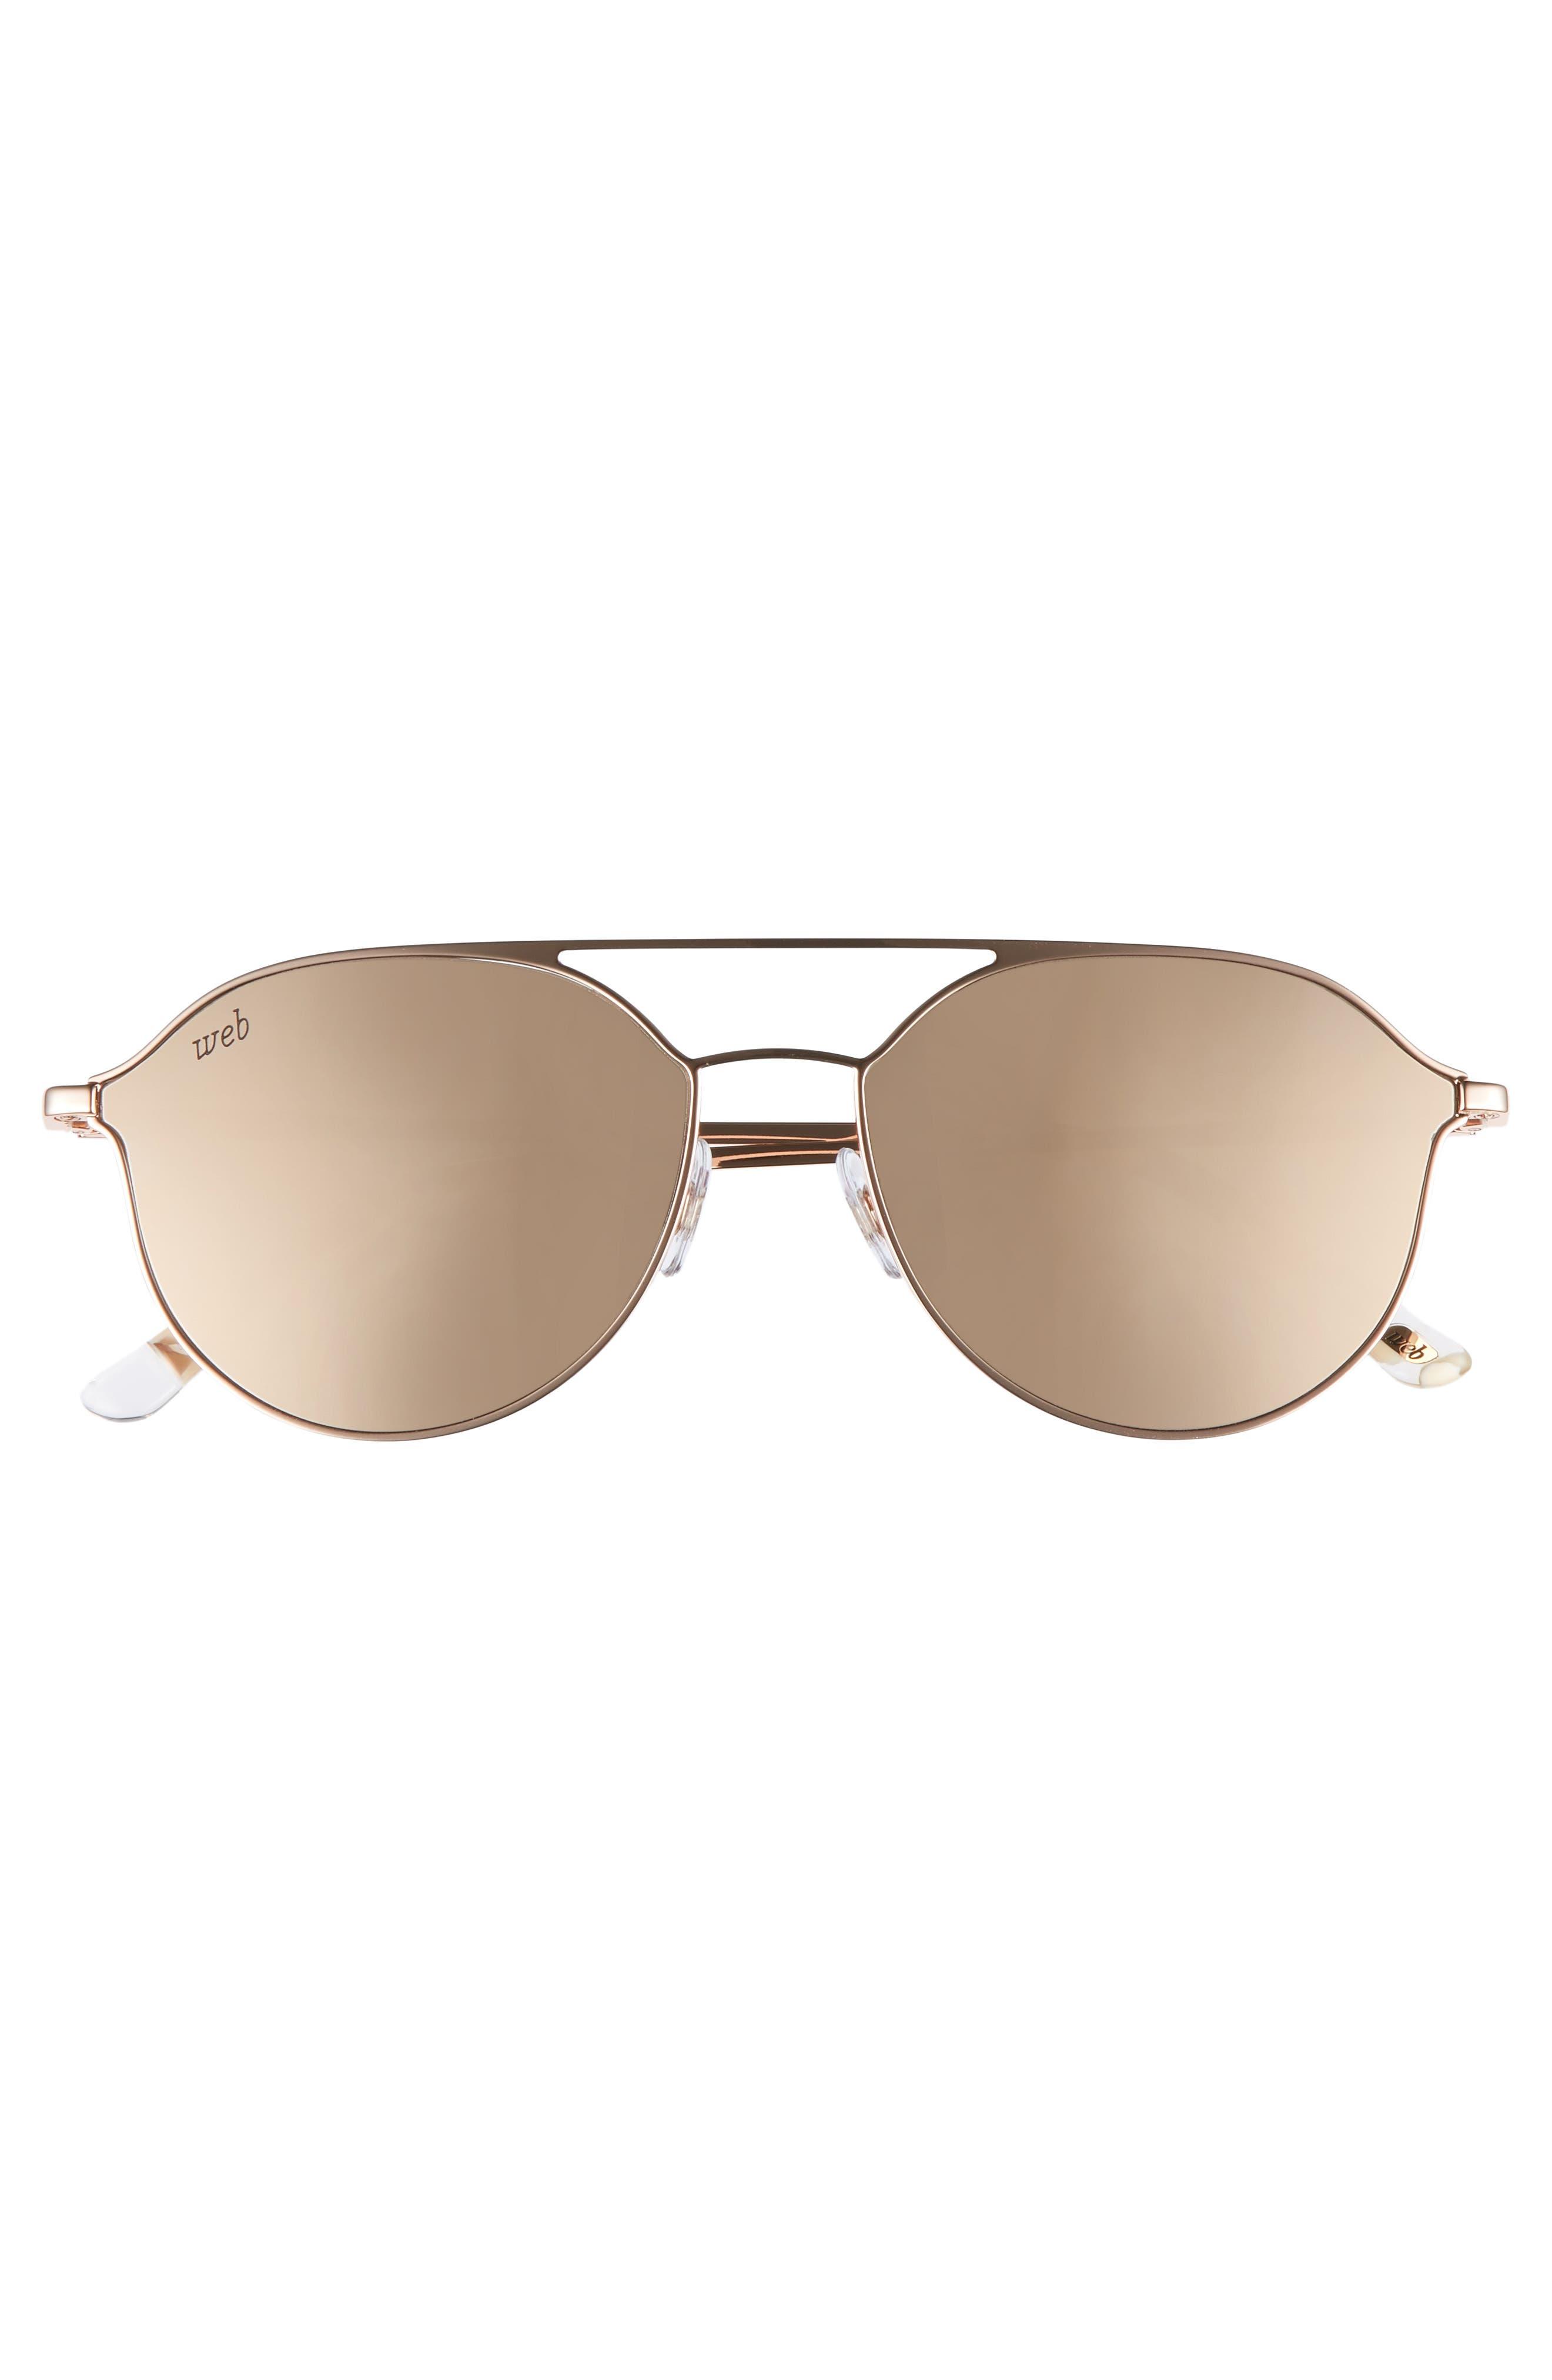 59mm Metal Aviator Sunglasses,                             Alternate thumbnail 3, color,                             LIGHT BRONZE/ BROWN